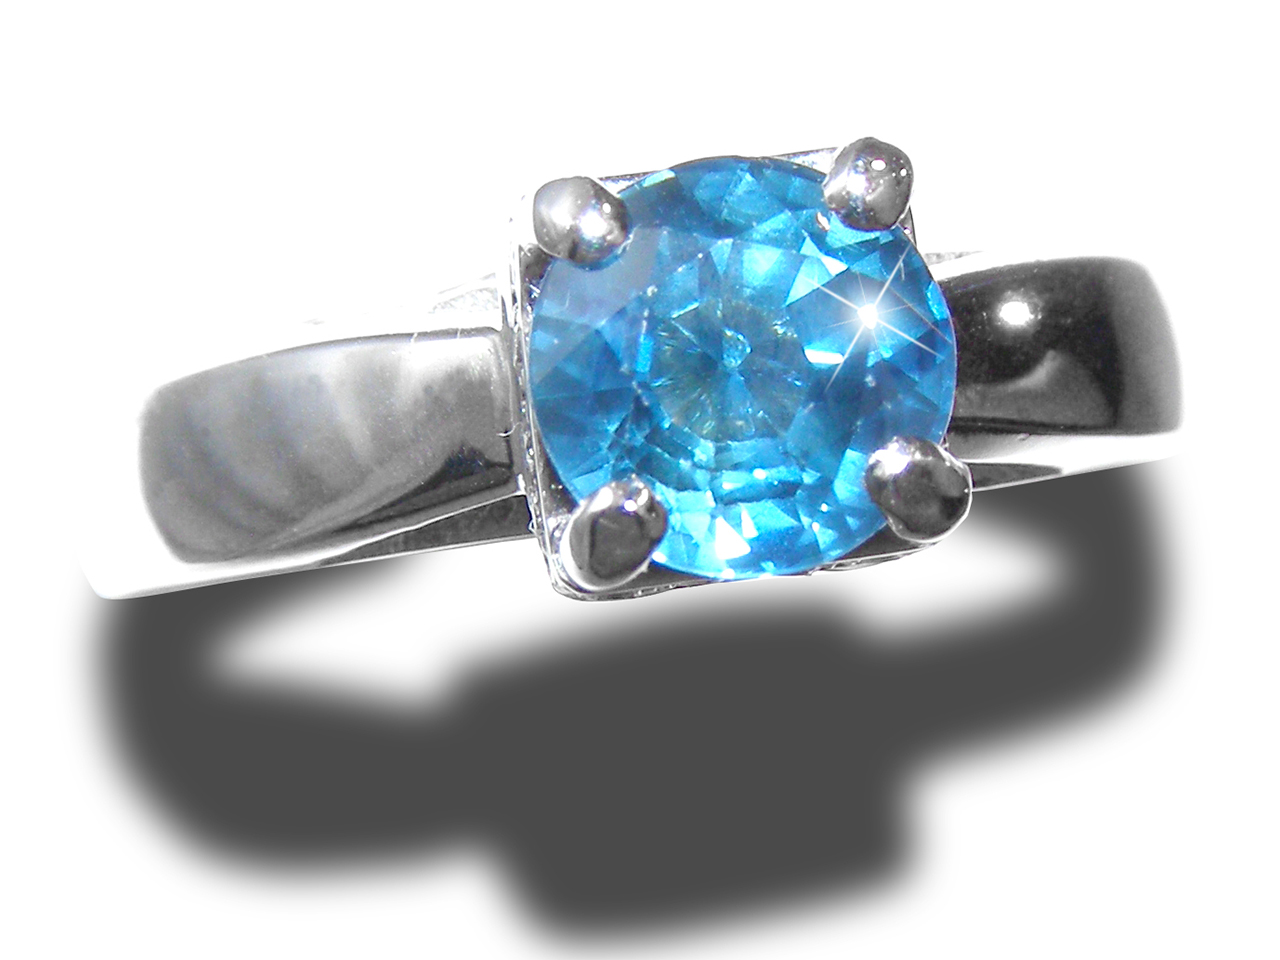 Brilliant Blue/Teal Sapphire Diamond Ring 14KWG 1.75 ctw